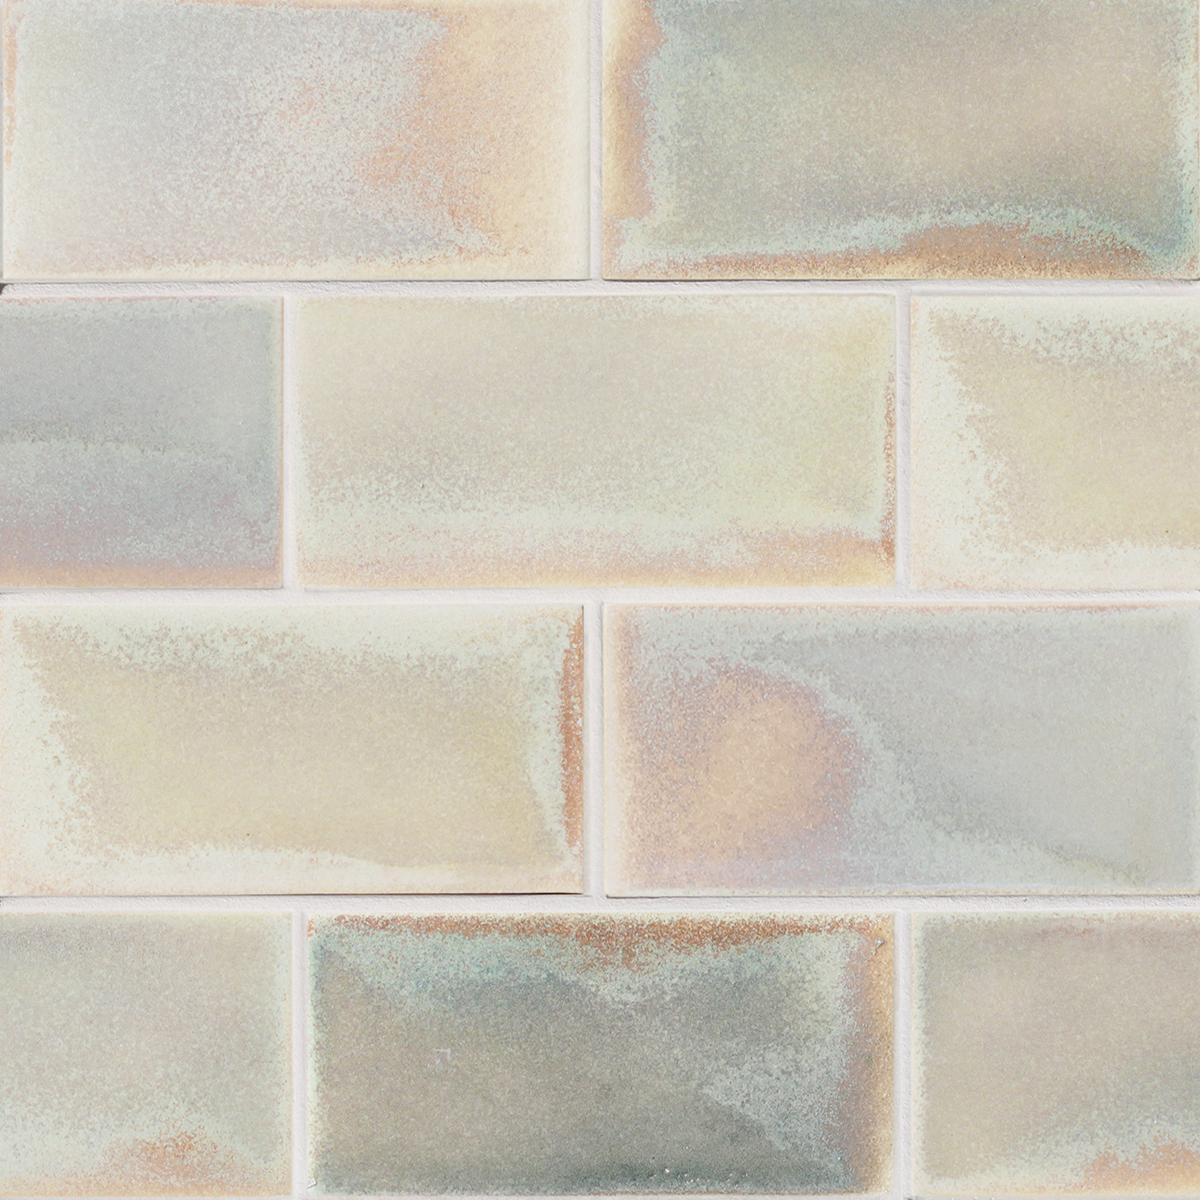 36 field tile encore ceramics 36 mirage dailygadgetfo Choice Image